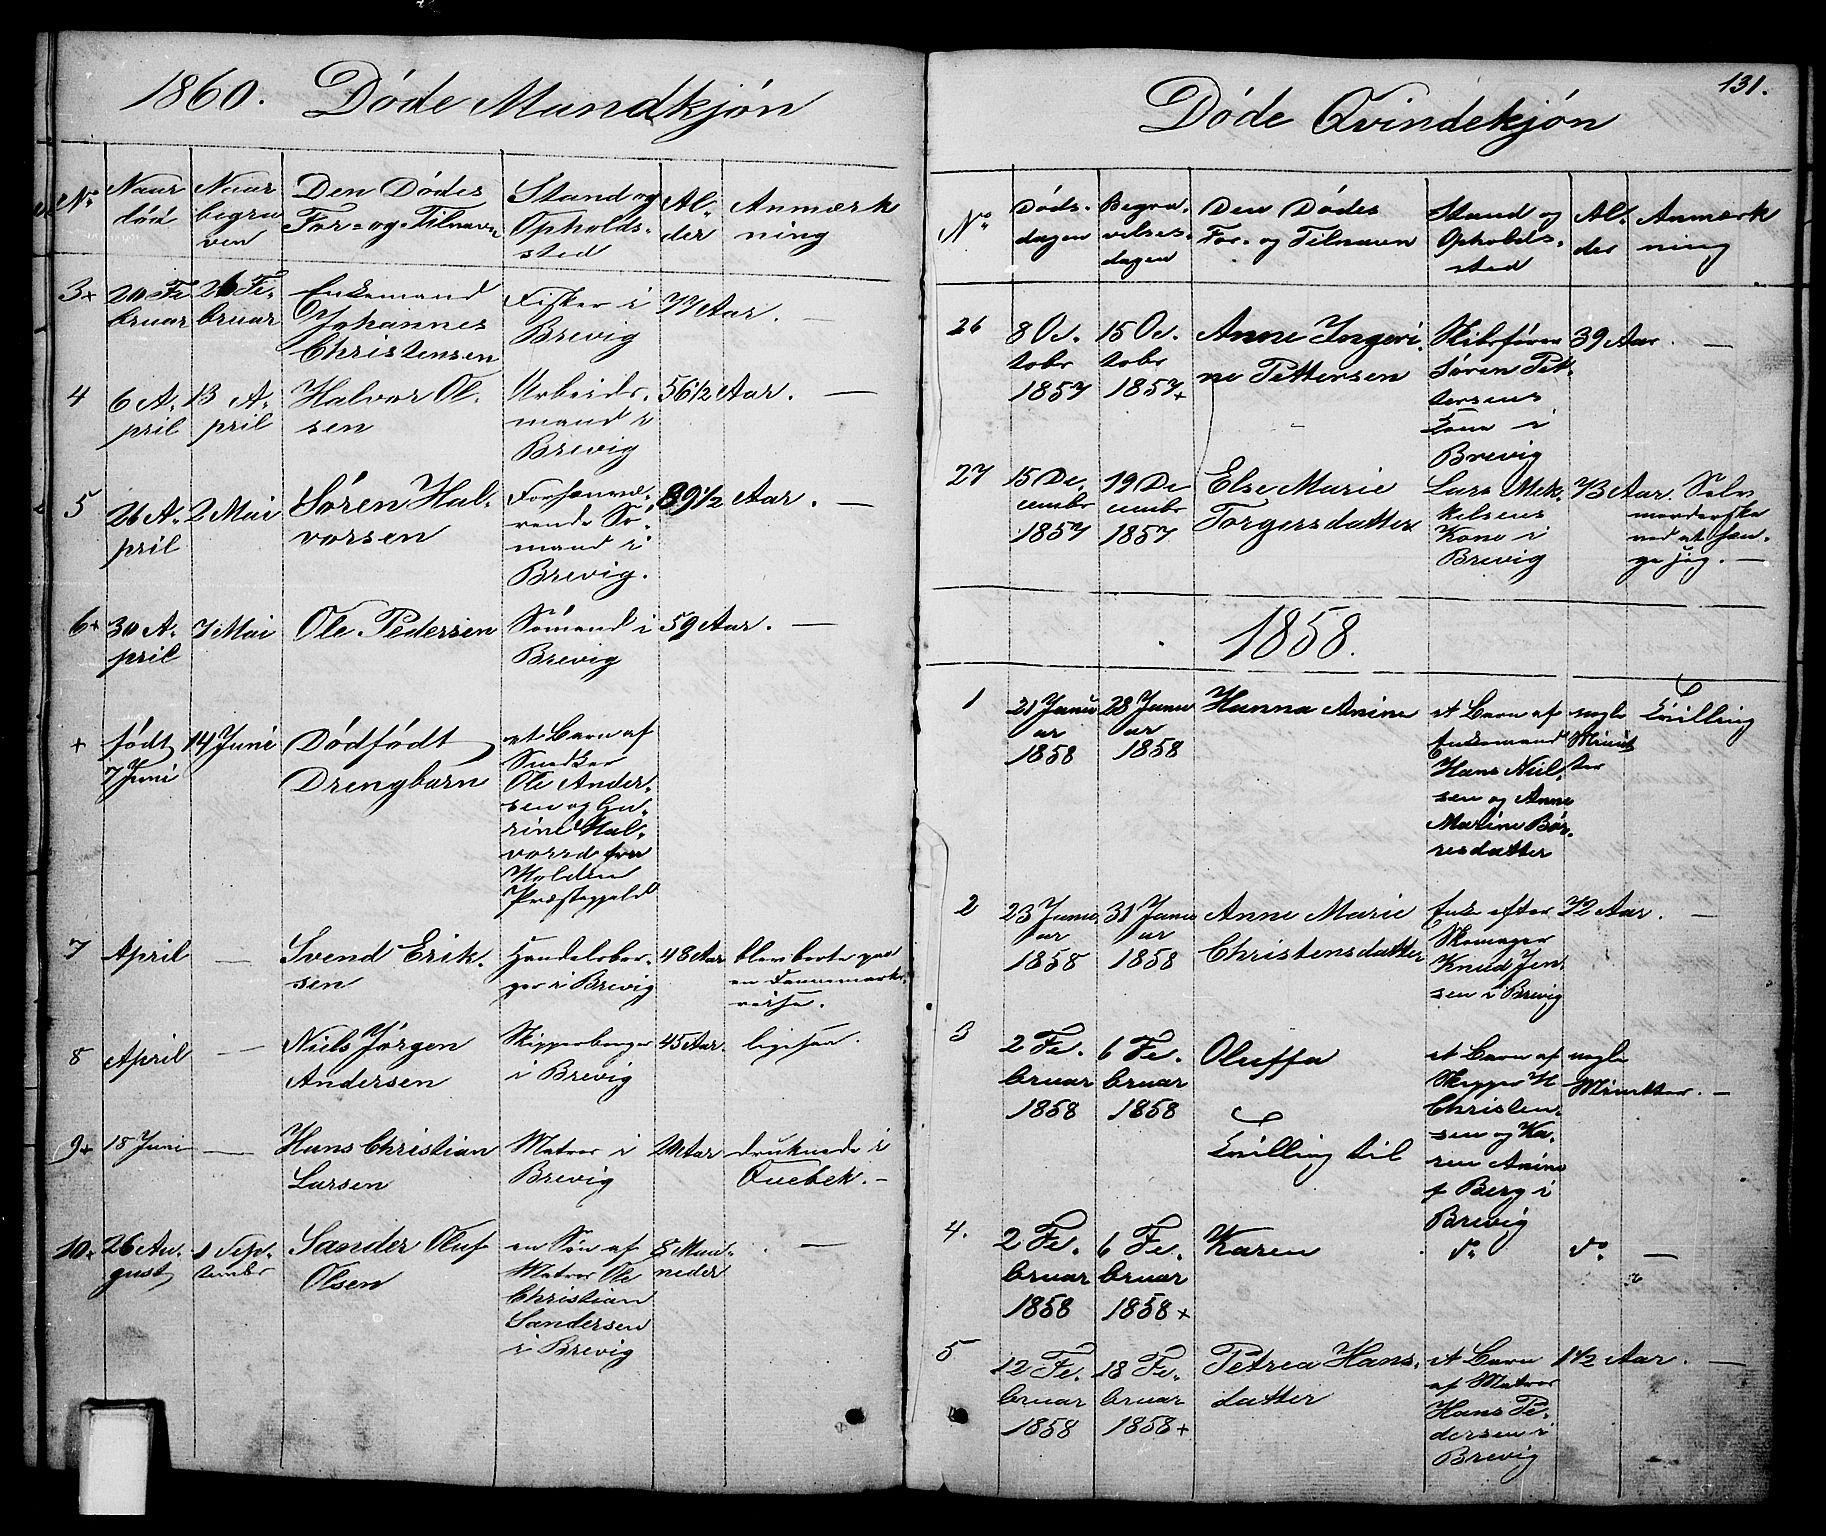 SAKO, Brevik kirkebøker, G/Ga/L0002: Klokkerbok nr. 2, 1846-1865, s. 131